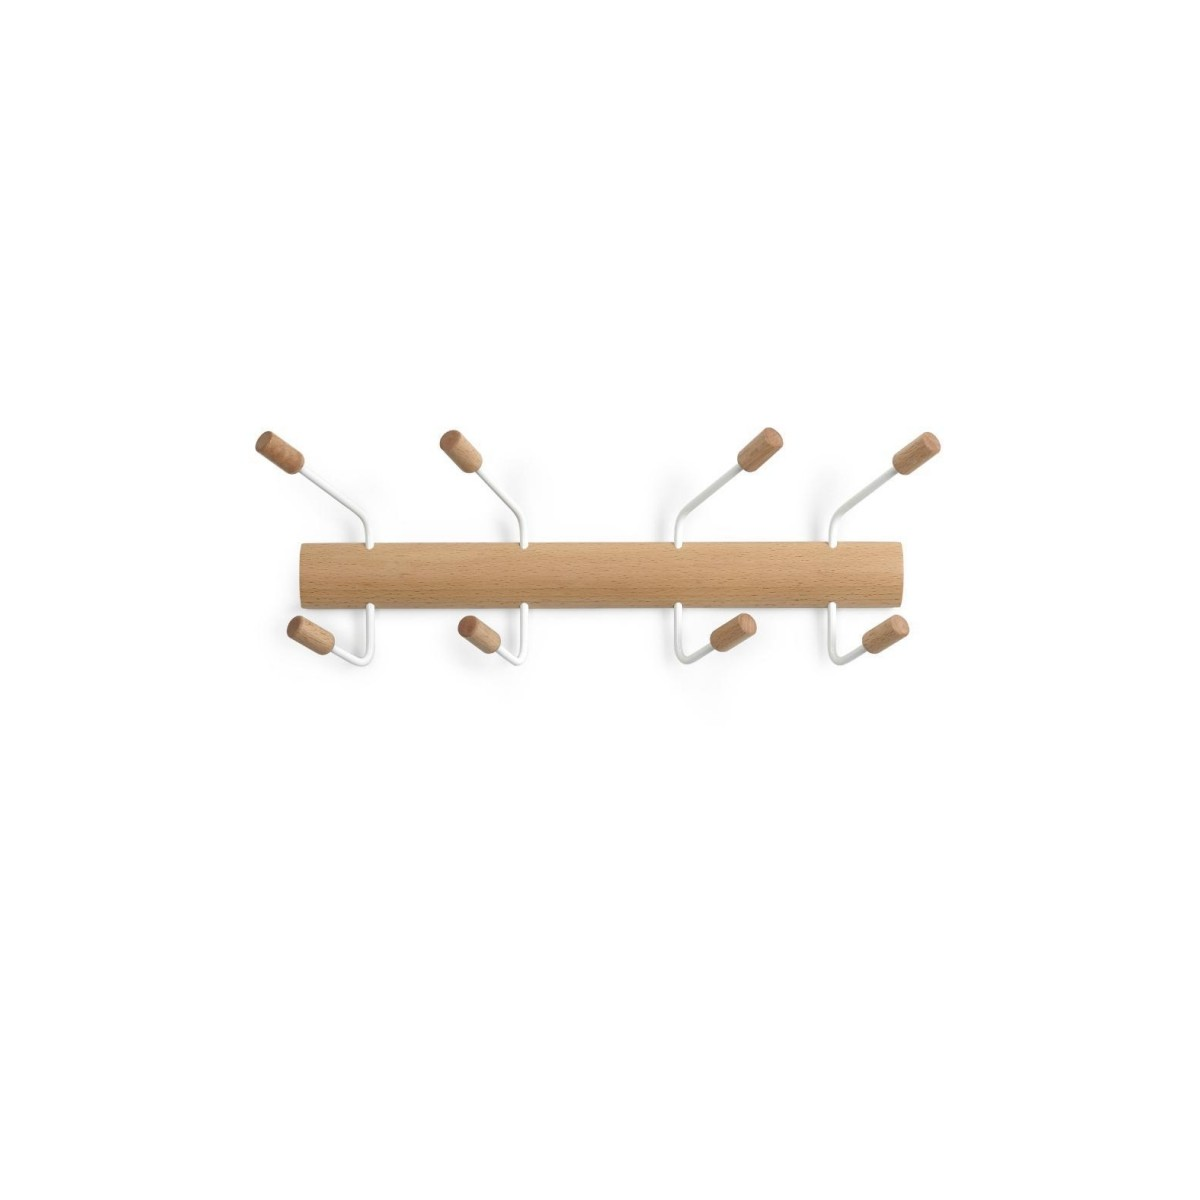 Cabideiro de Parede 8 Ganchos POGO - Natural / branco - Umbra